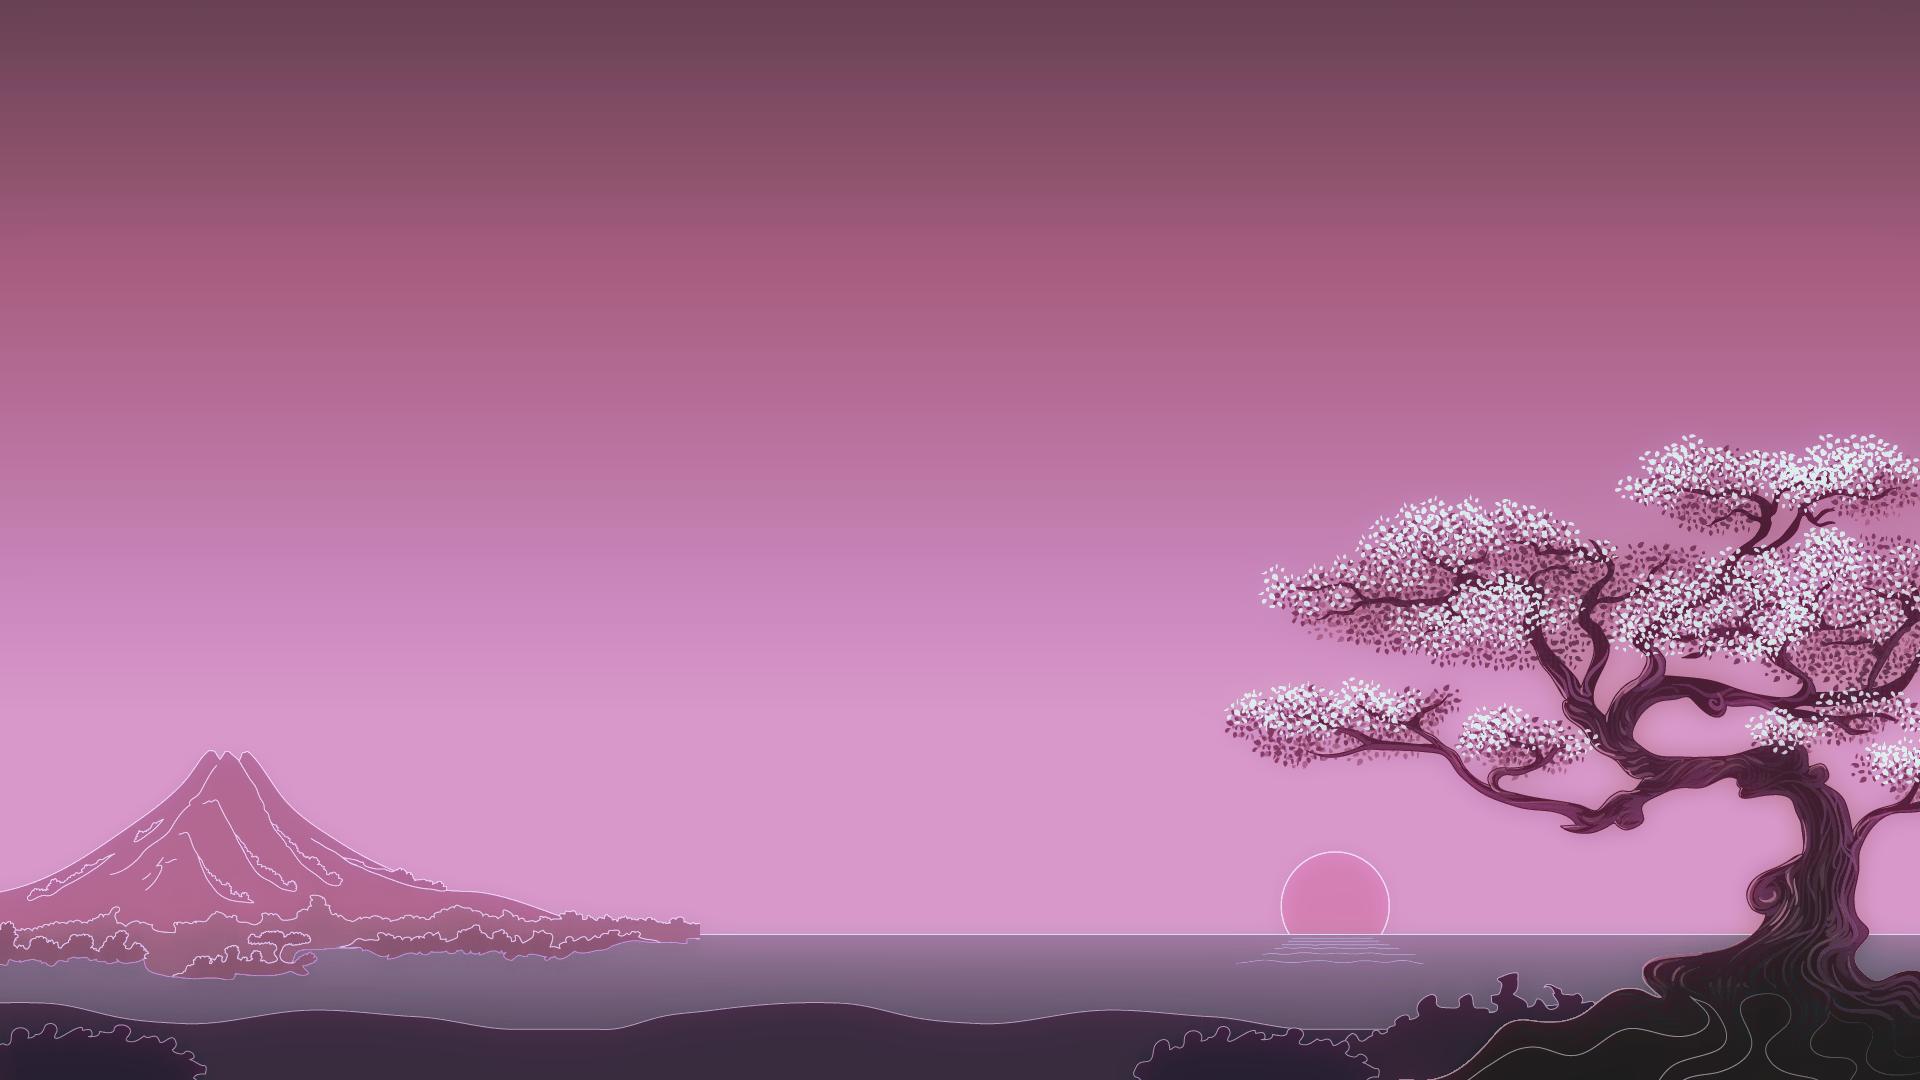 General 1920x1080 minimalism digital art trees Sun simple background Japan